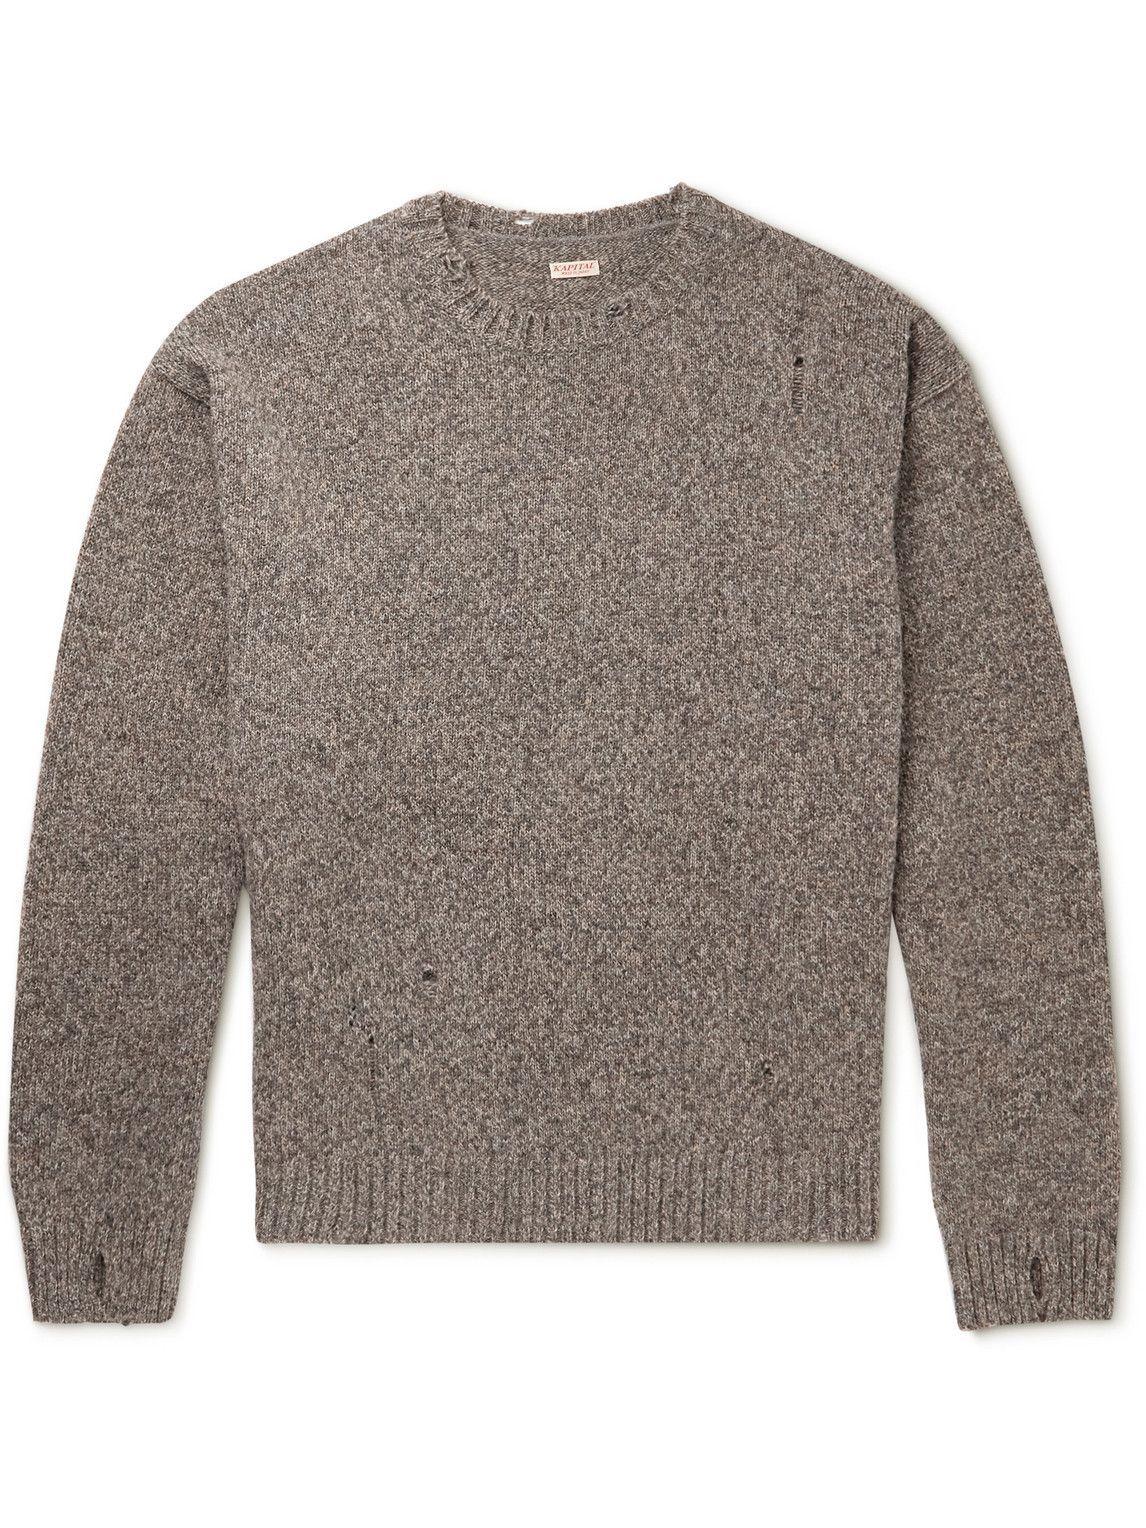 Photo: KAPITAL - Distressed Intarsia Wool Sweater - Gray